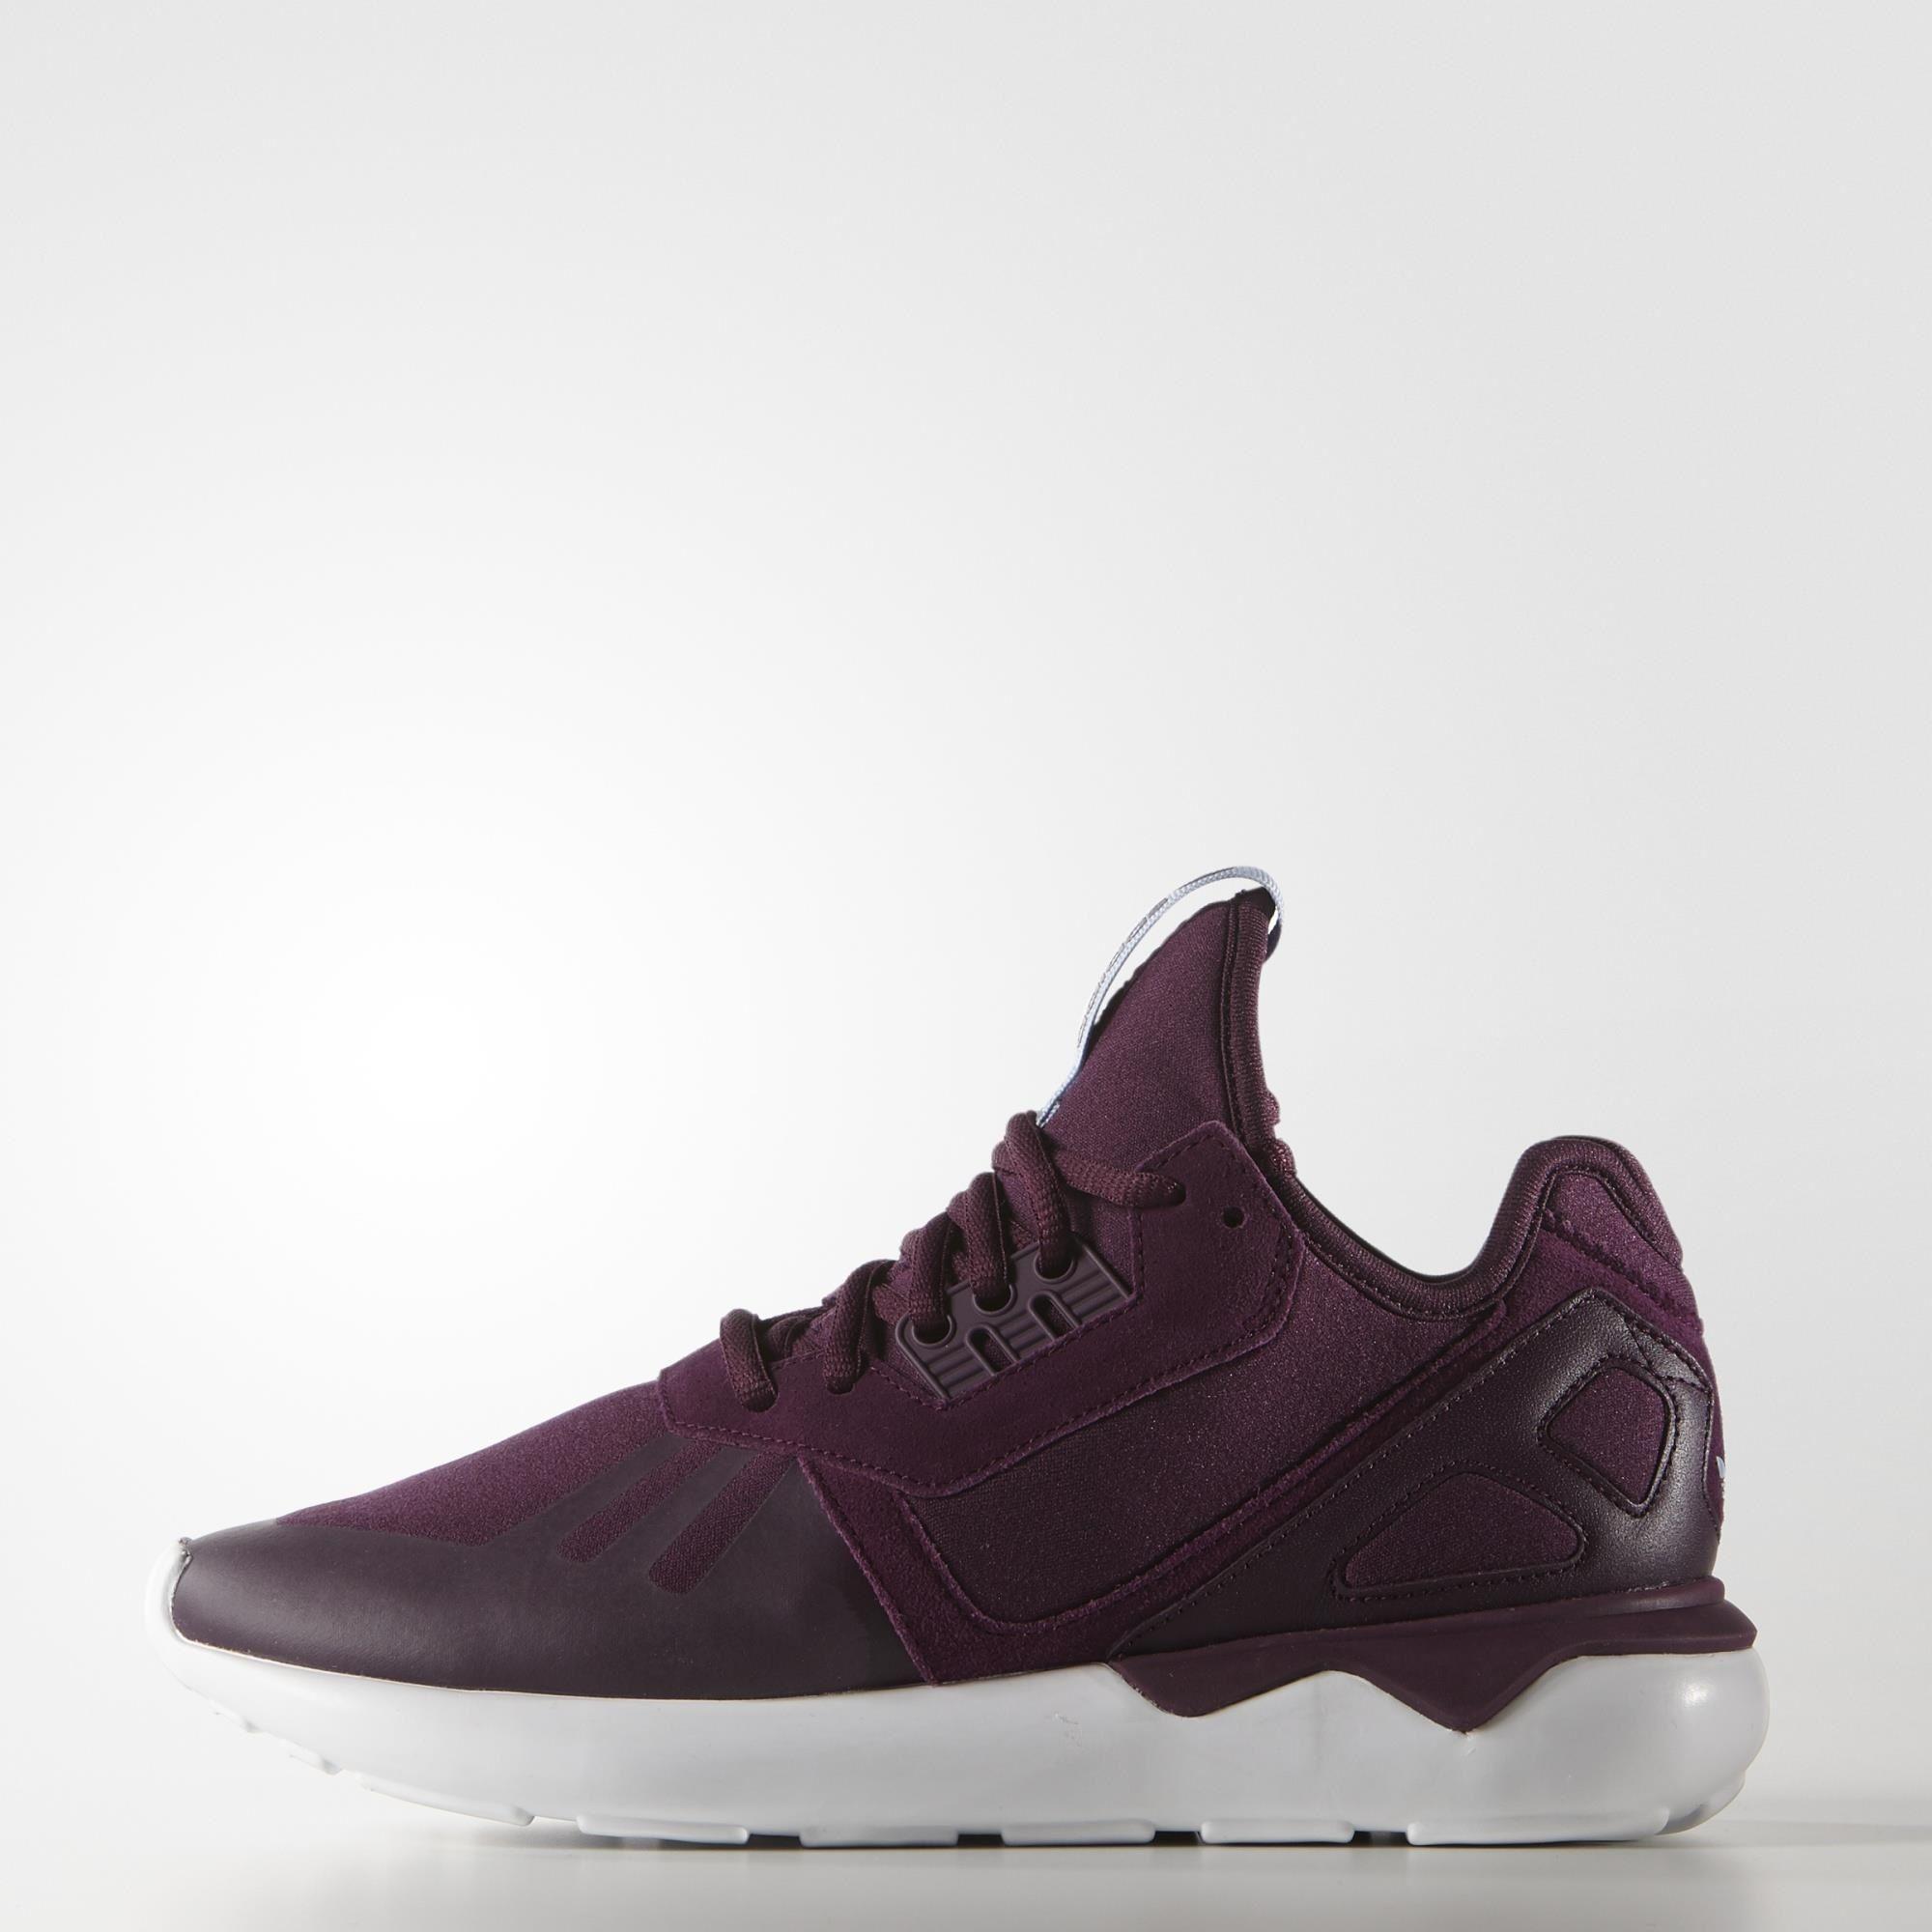 new arrivals a8a8d 3ec75 ... best adidas tubular runner shoes multicolor adidas us fc075 5dd95